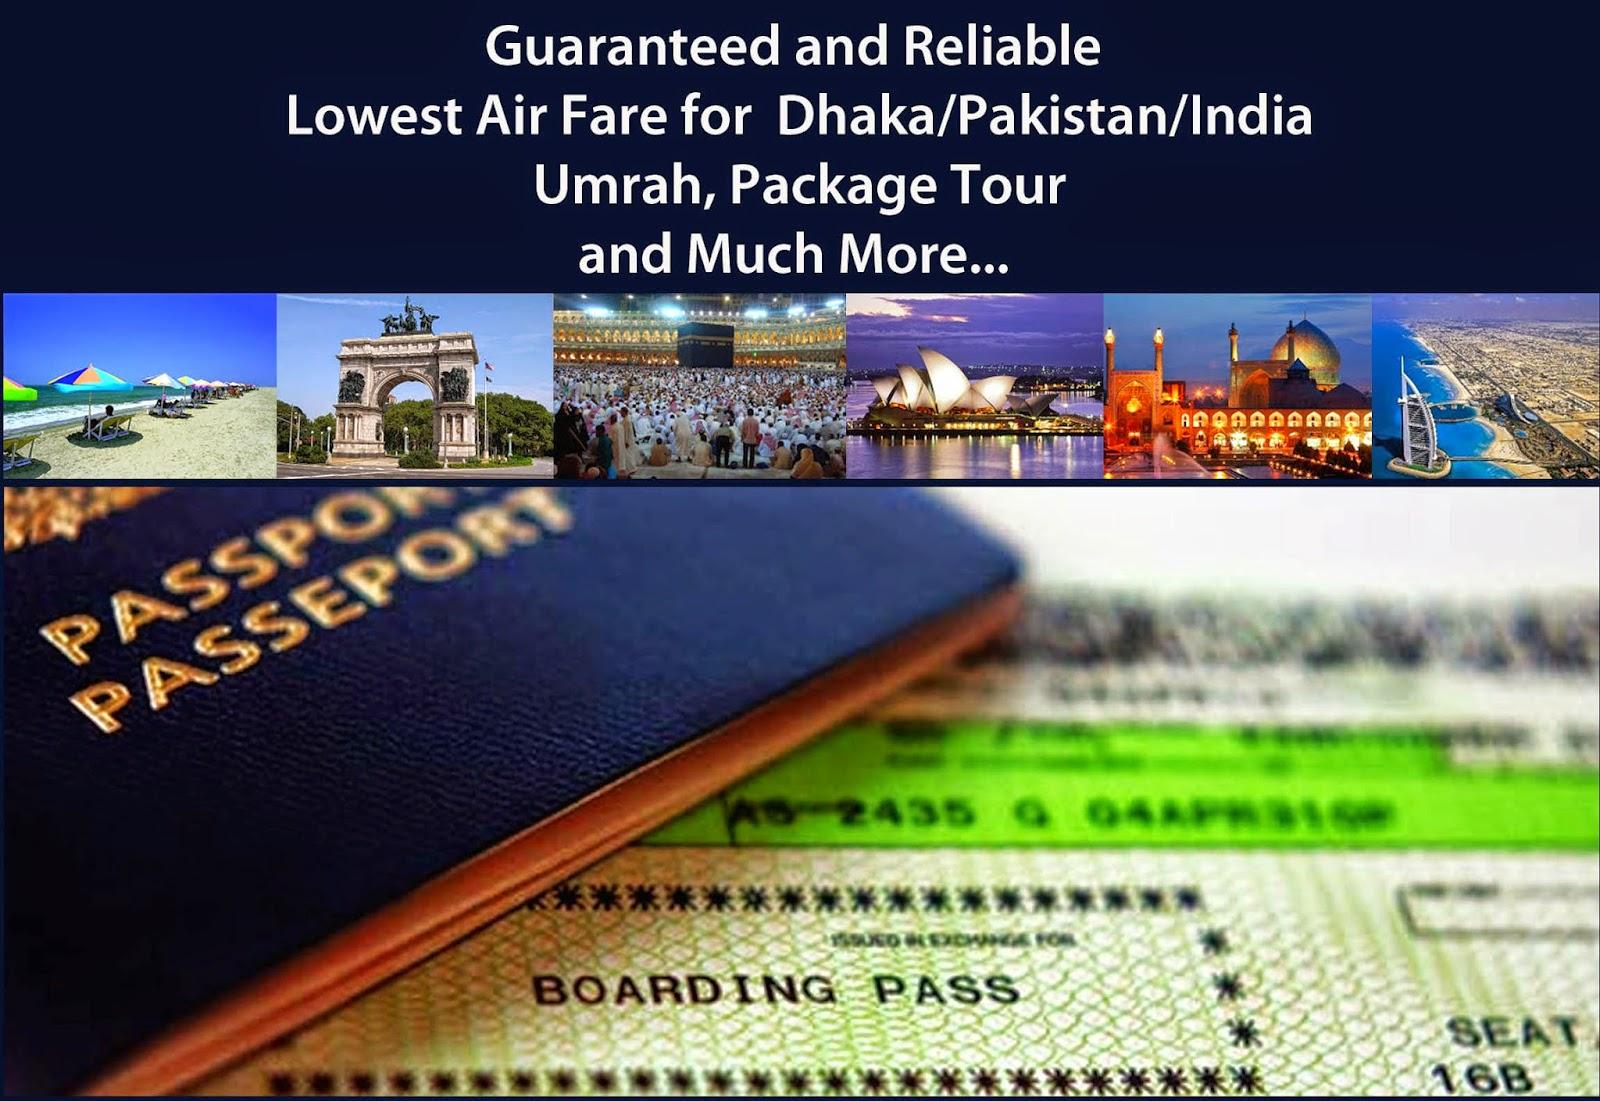 Golden Bangla Travel & Tour: Welcome to Golden Bangla Travel